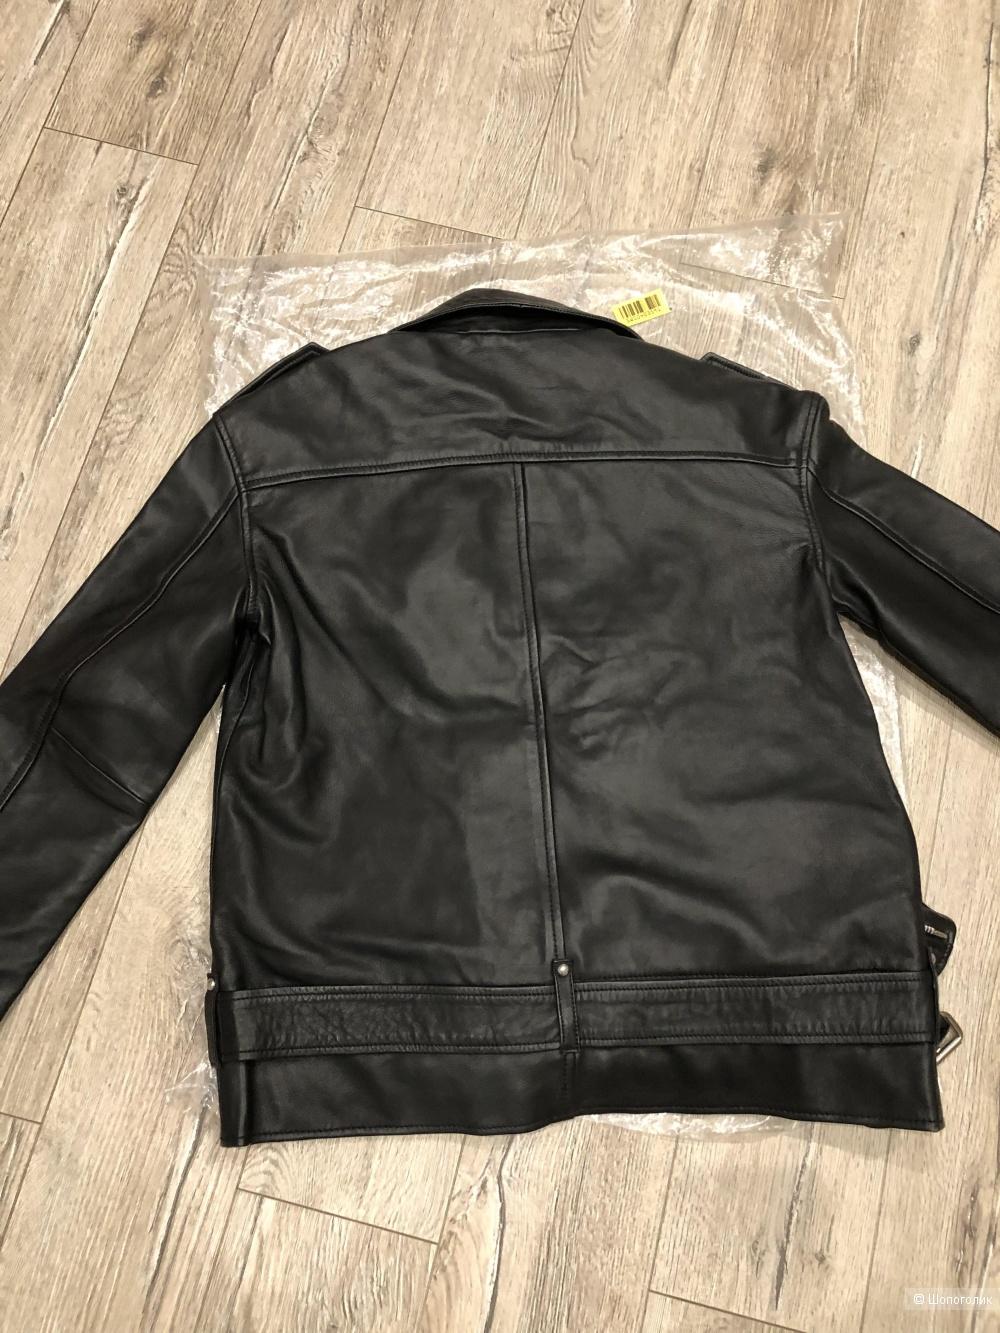 Кожаная куртка Walter Baker S